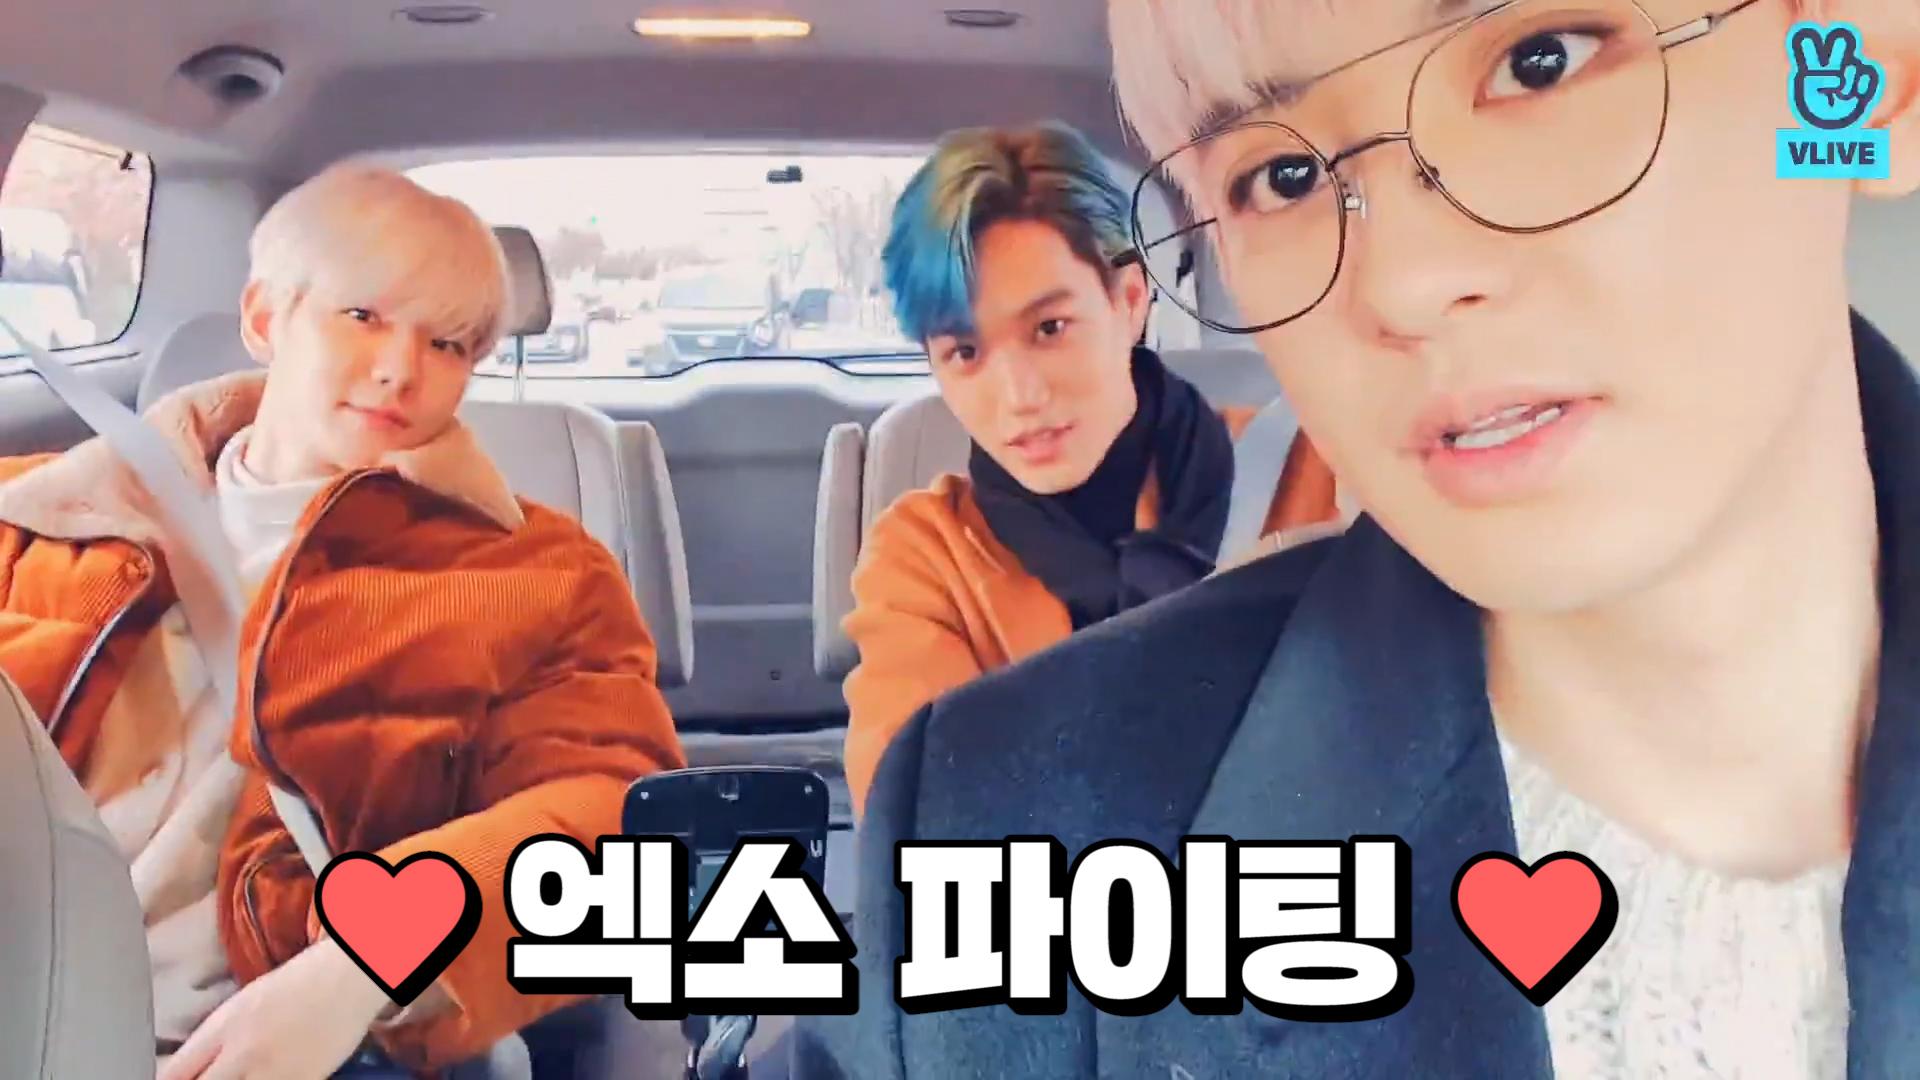 [EXO] 엑소의 열정 넘치는 막내매니저를 소개합니다❤️ (EXO introducing their new manager)